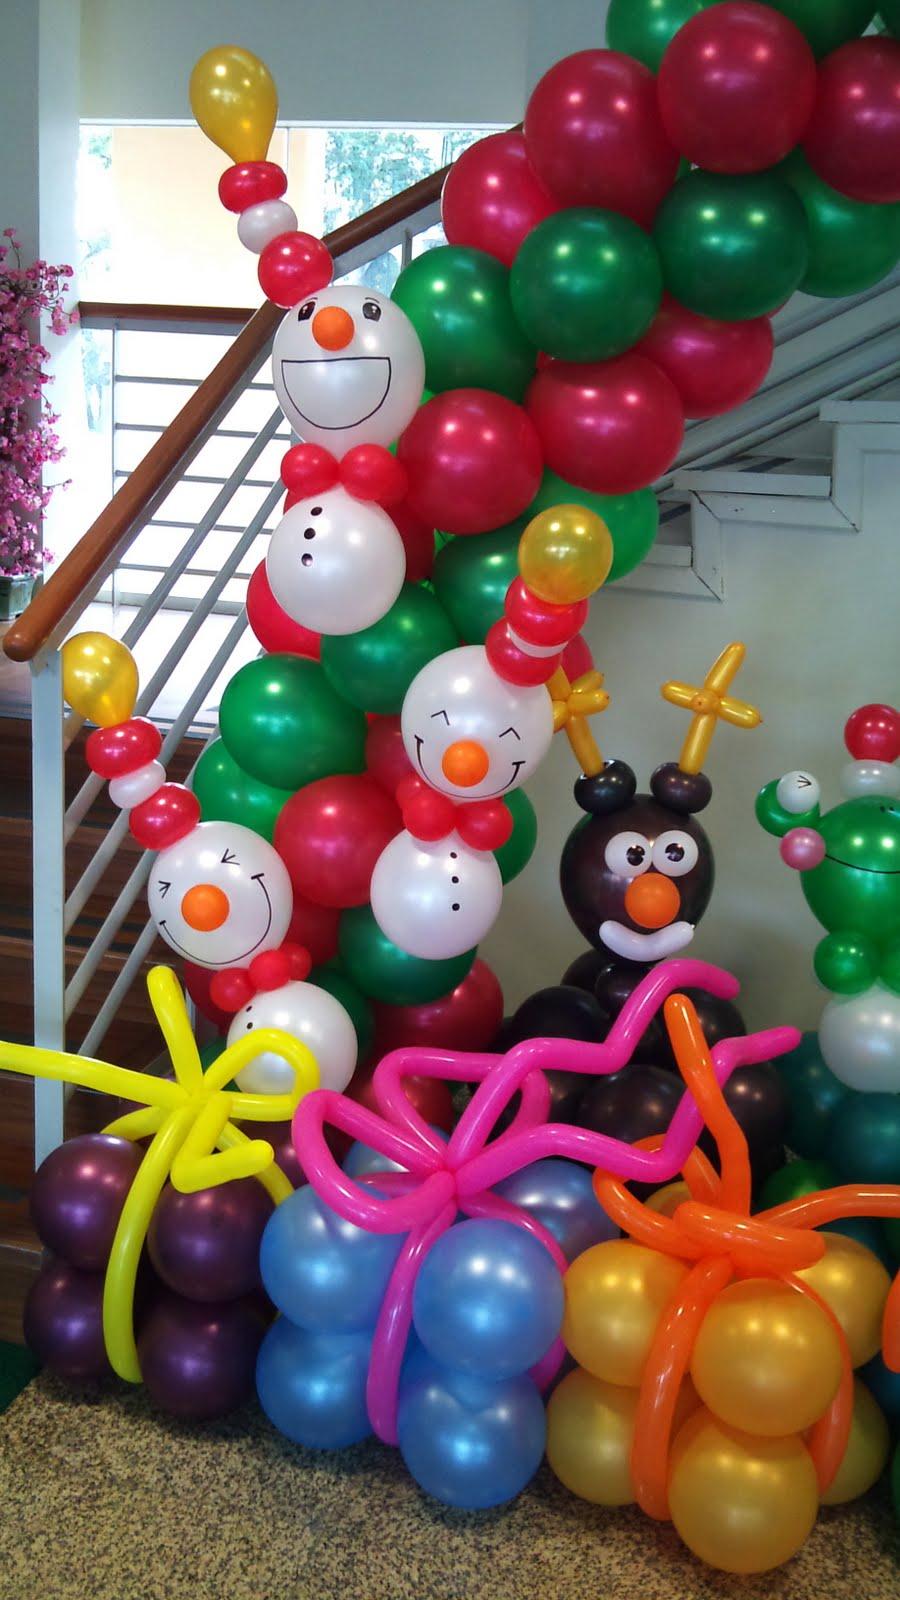 Balloon decorations for weddings birthday parties balloon sculptures in kuching and miri - Ideas decoracion navidad ...